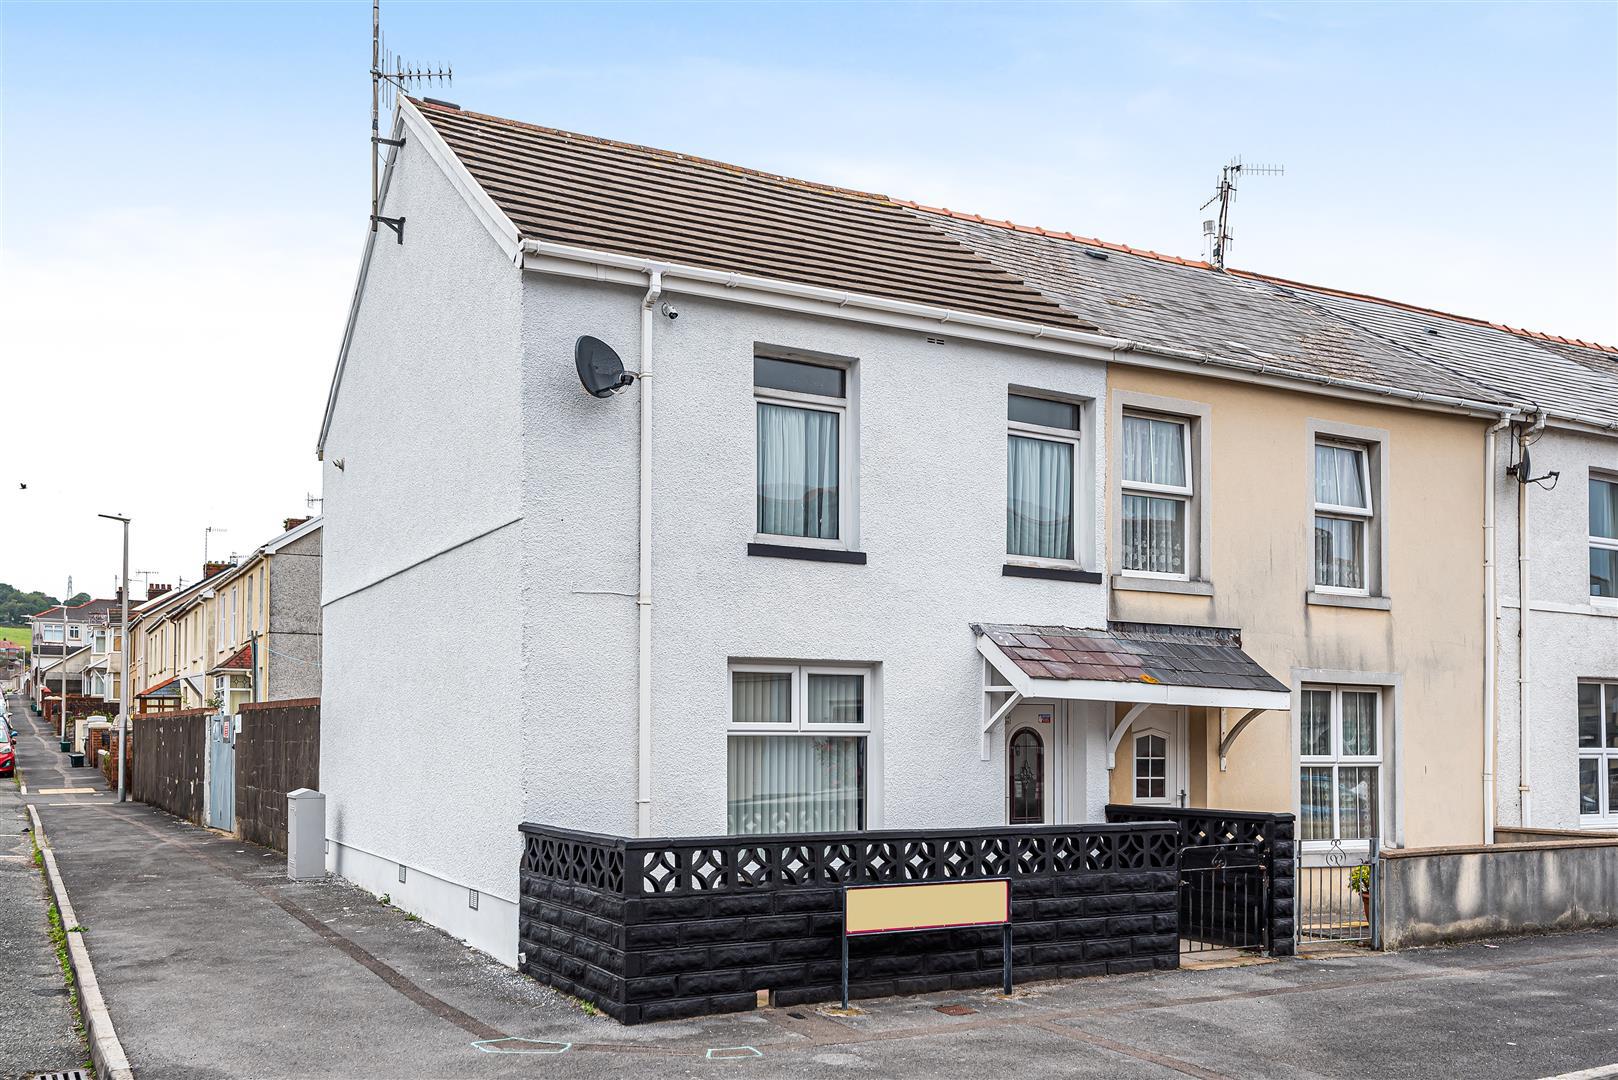 Derwent Street, Llanelli, SA15 3EP